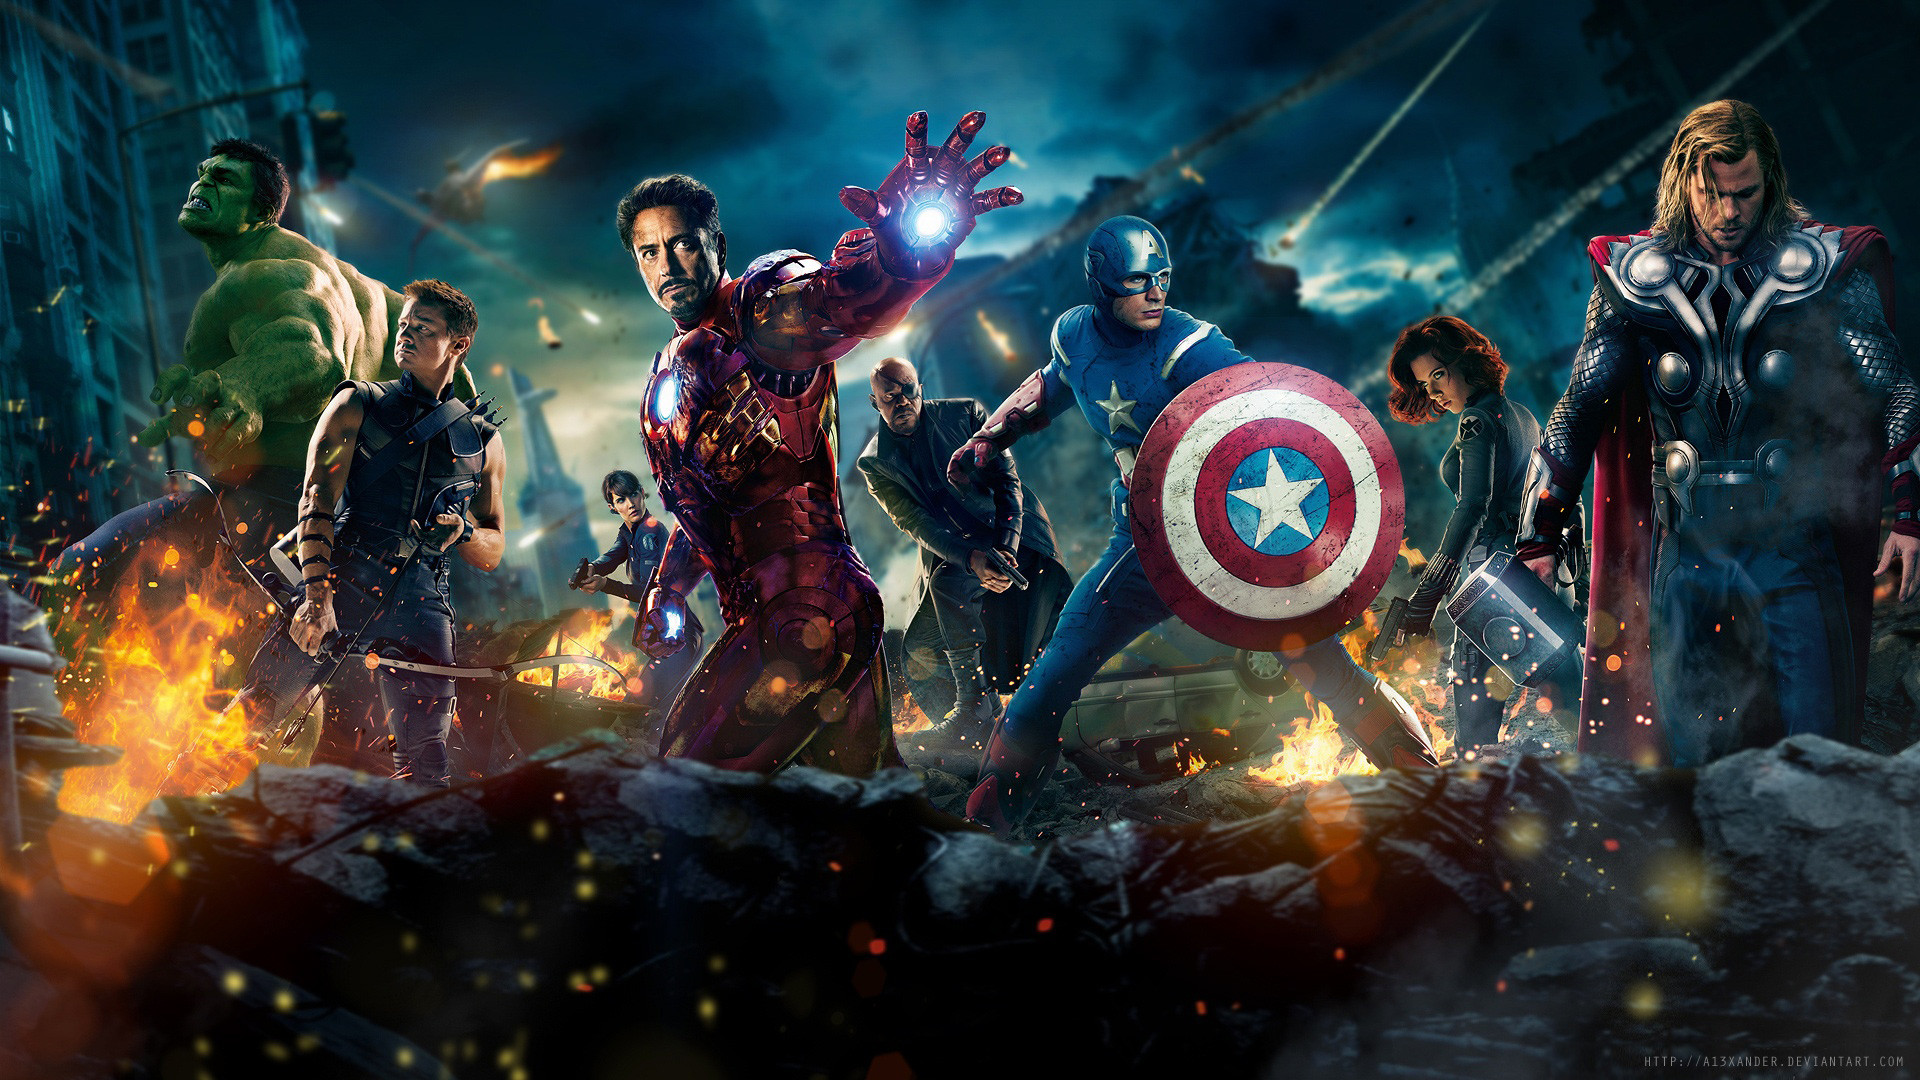 Avengers | Full HD Wallpapers, download 1080p desktop backgrounds